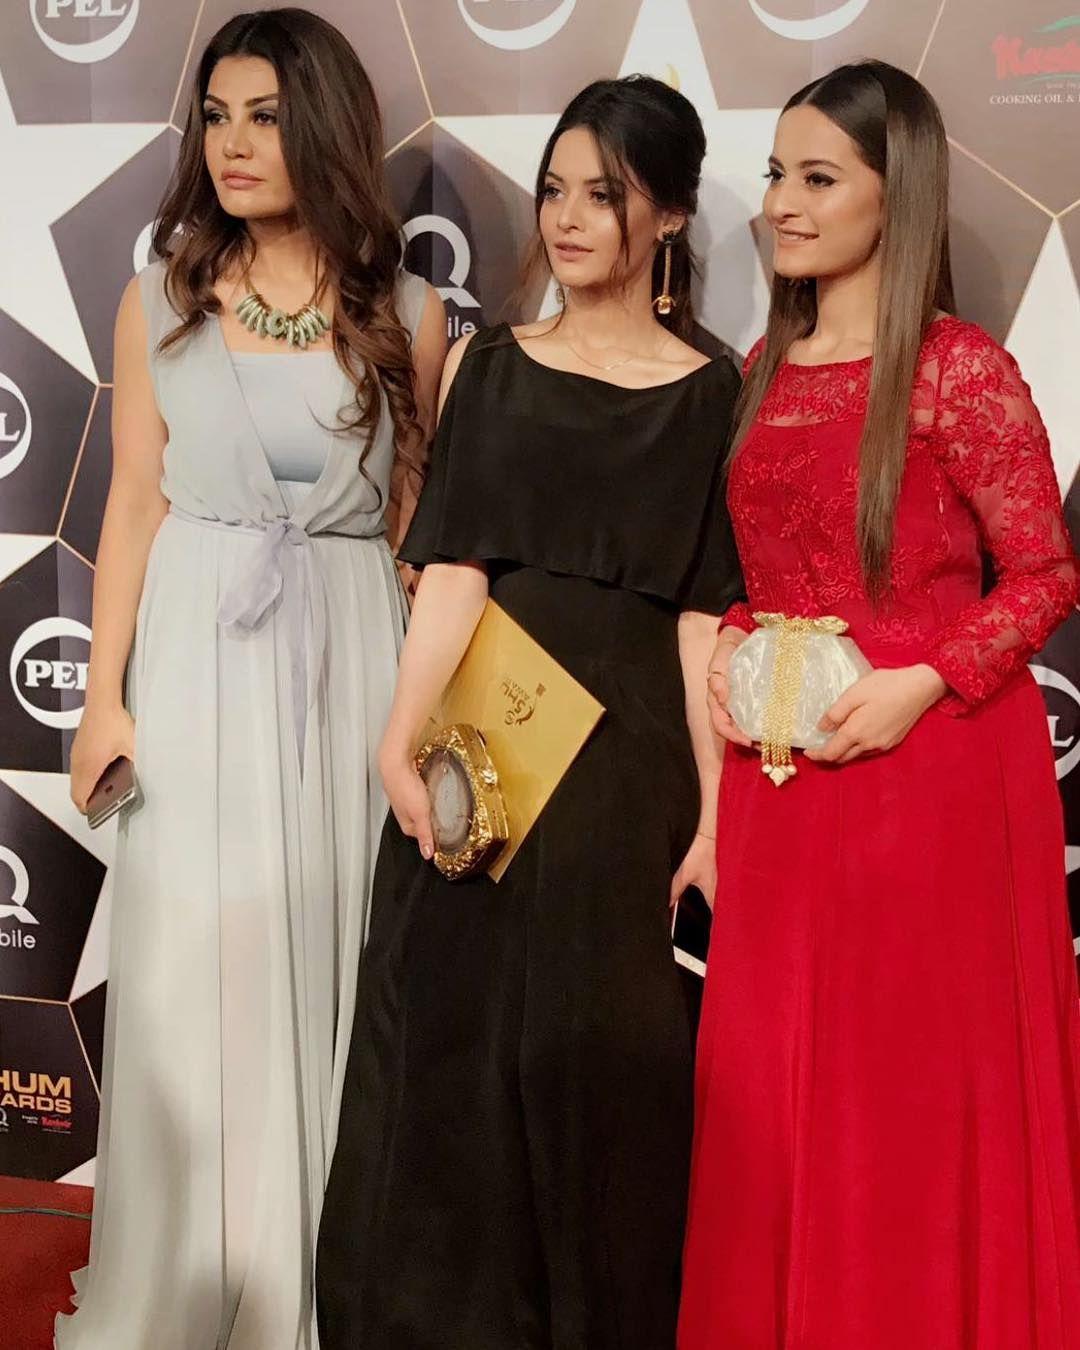 #Erumkhan #MinalKhan &  #AimanKhan Look Beautiful at the Red Carpet of #5thHumAwards #HappeningNow #ModernPakistaniElites ‼️